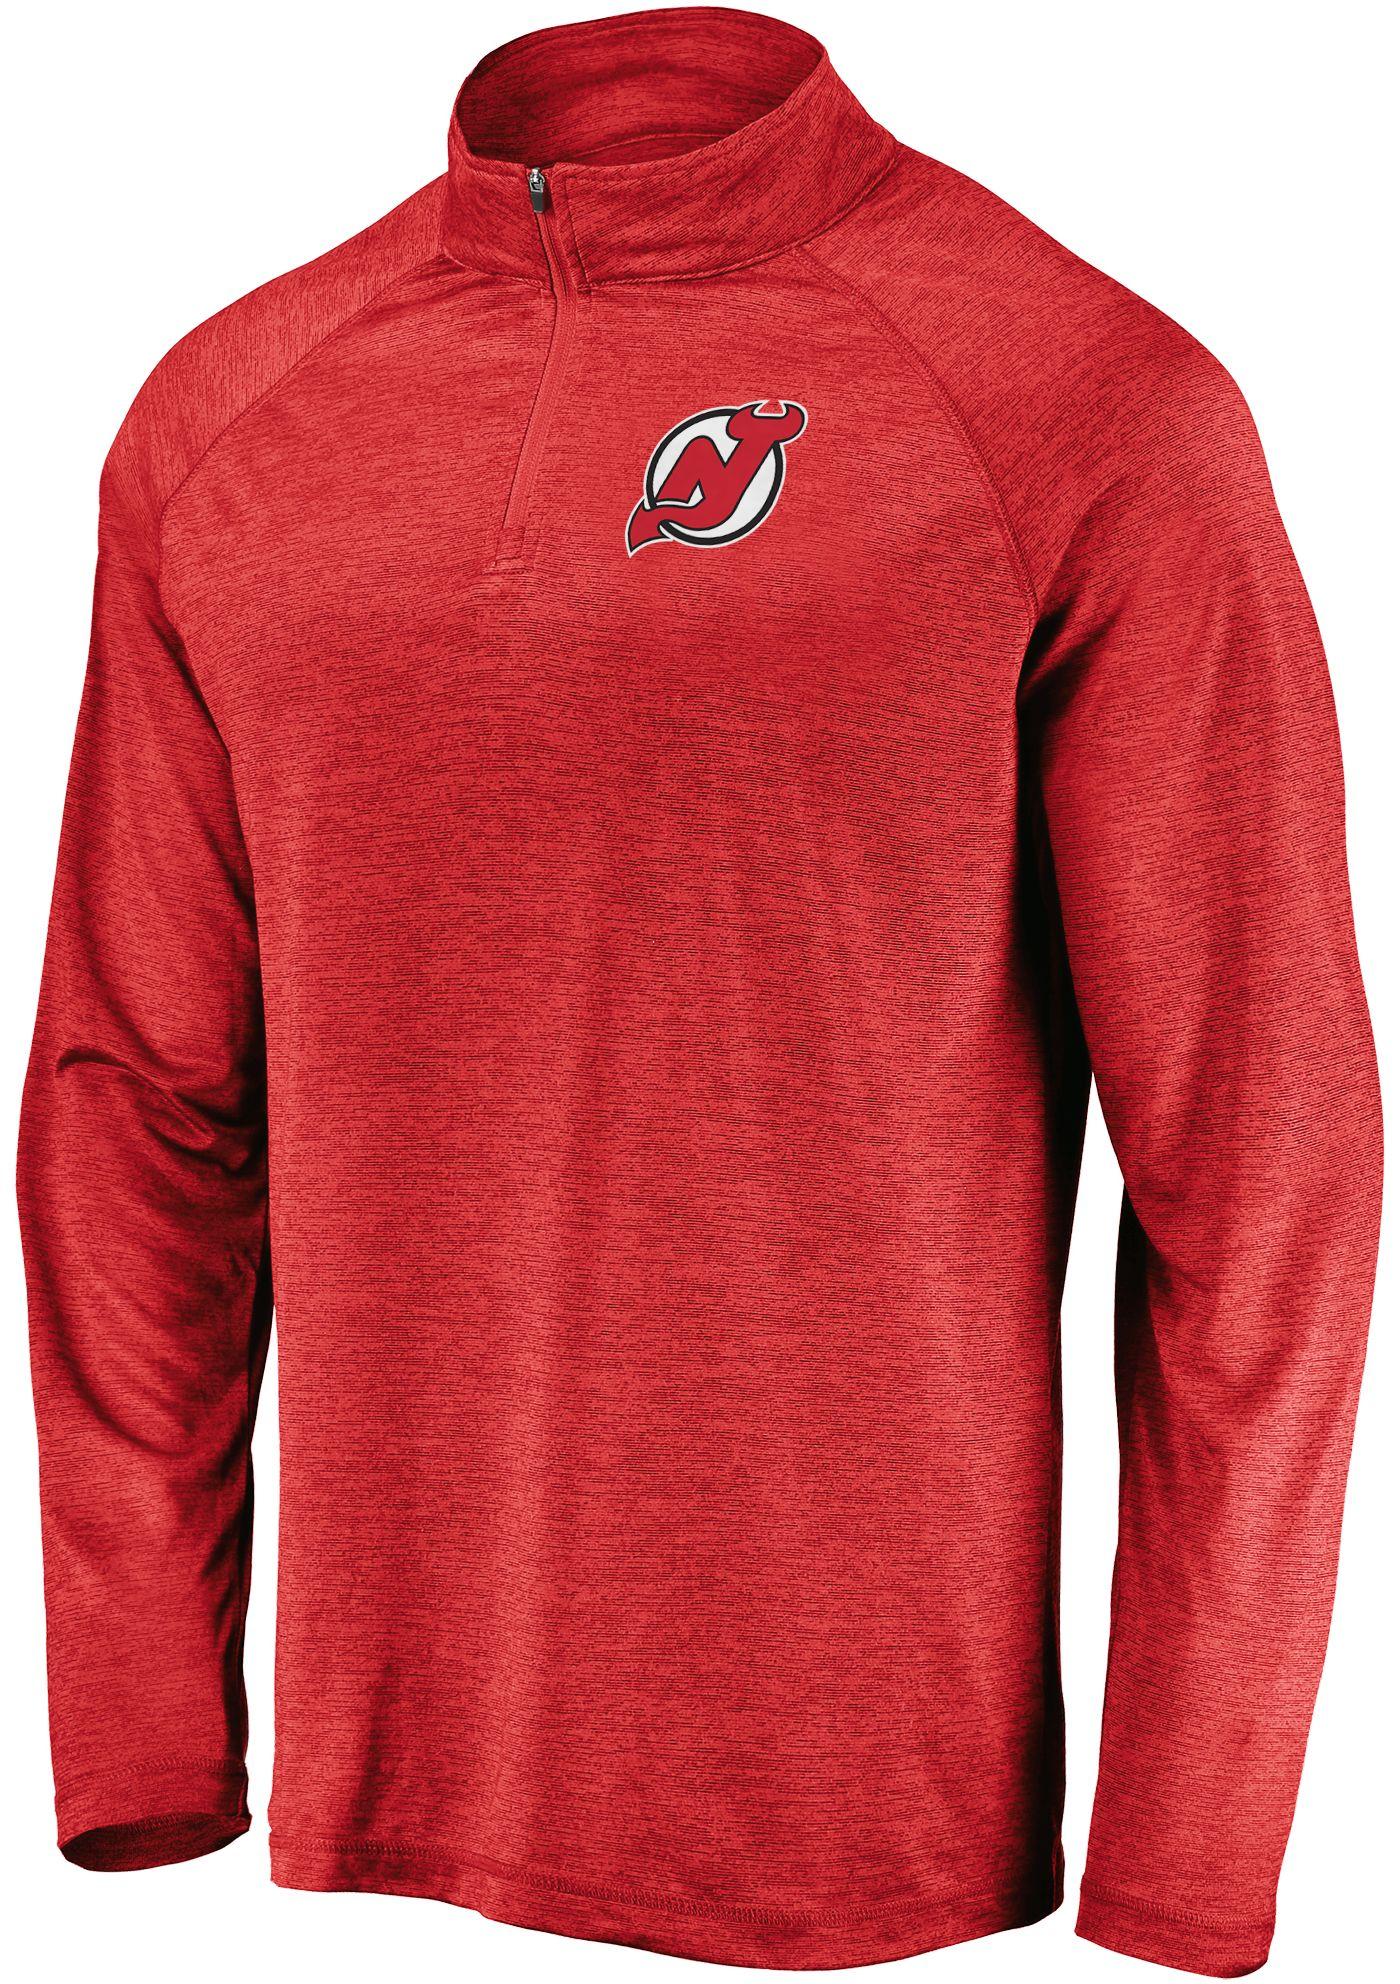 NHL Men's New Jersey Devils Logo Red Heathered Quarter-Zip Pullover